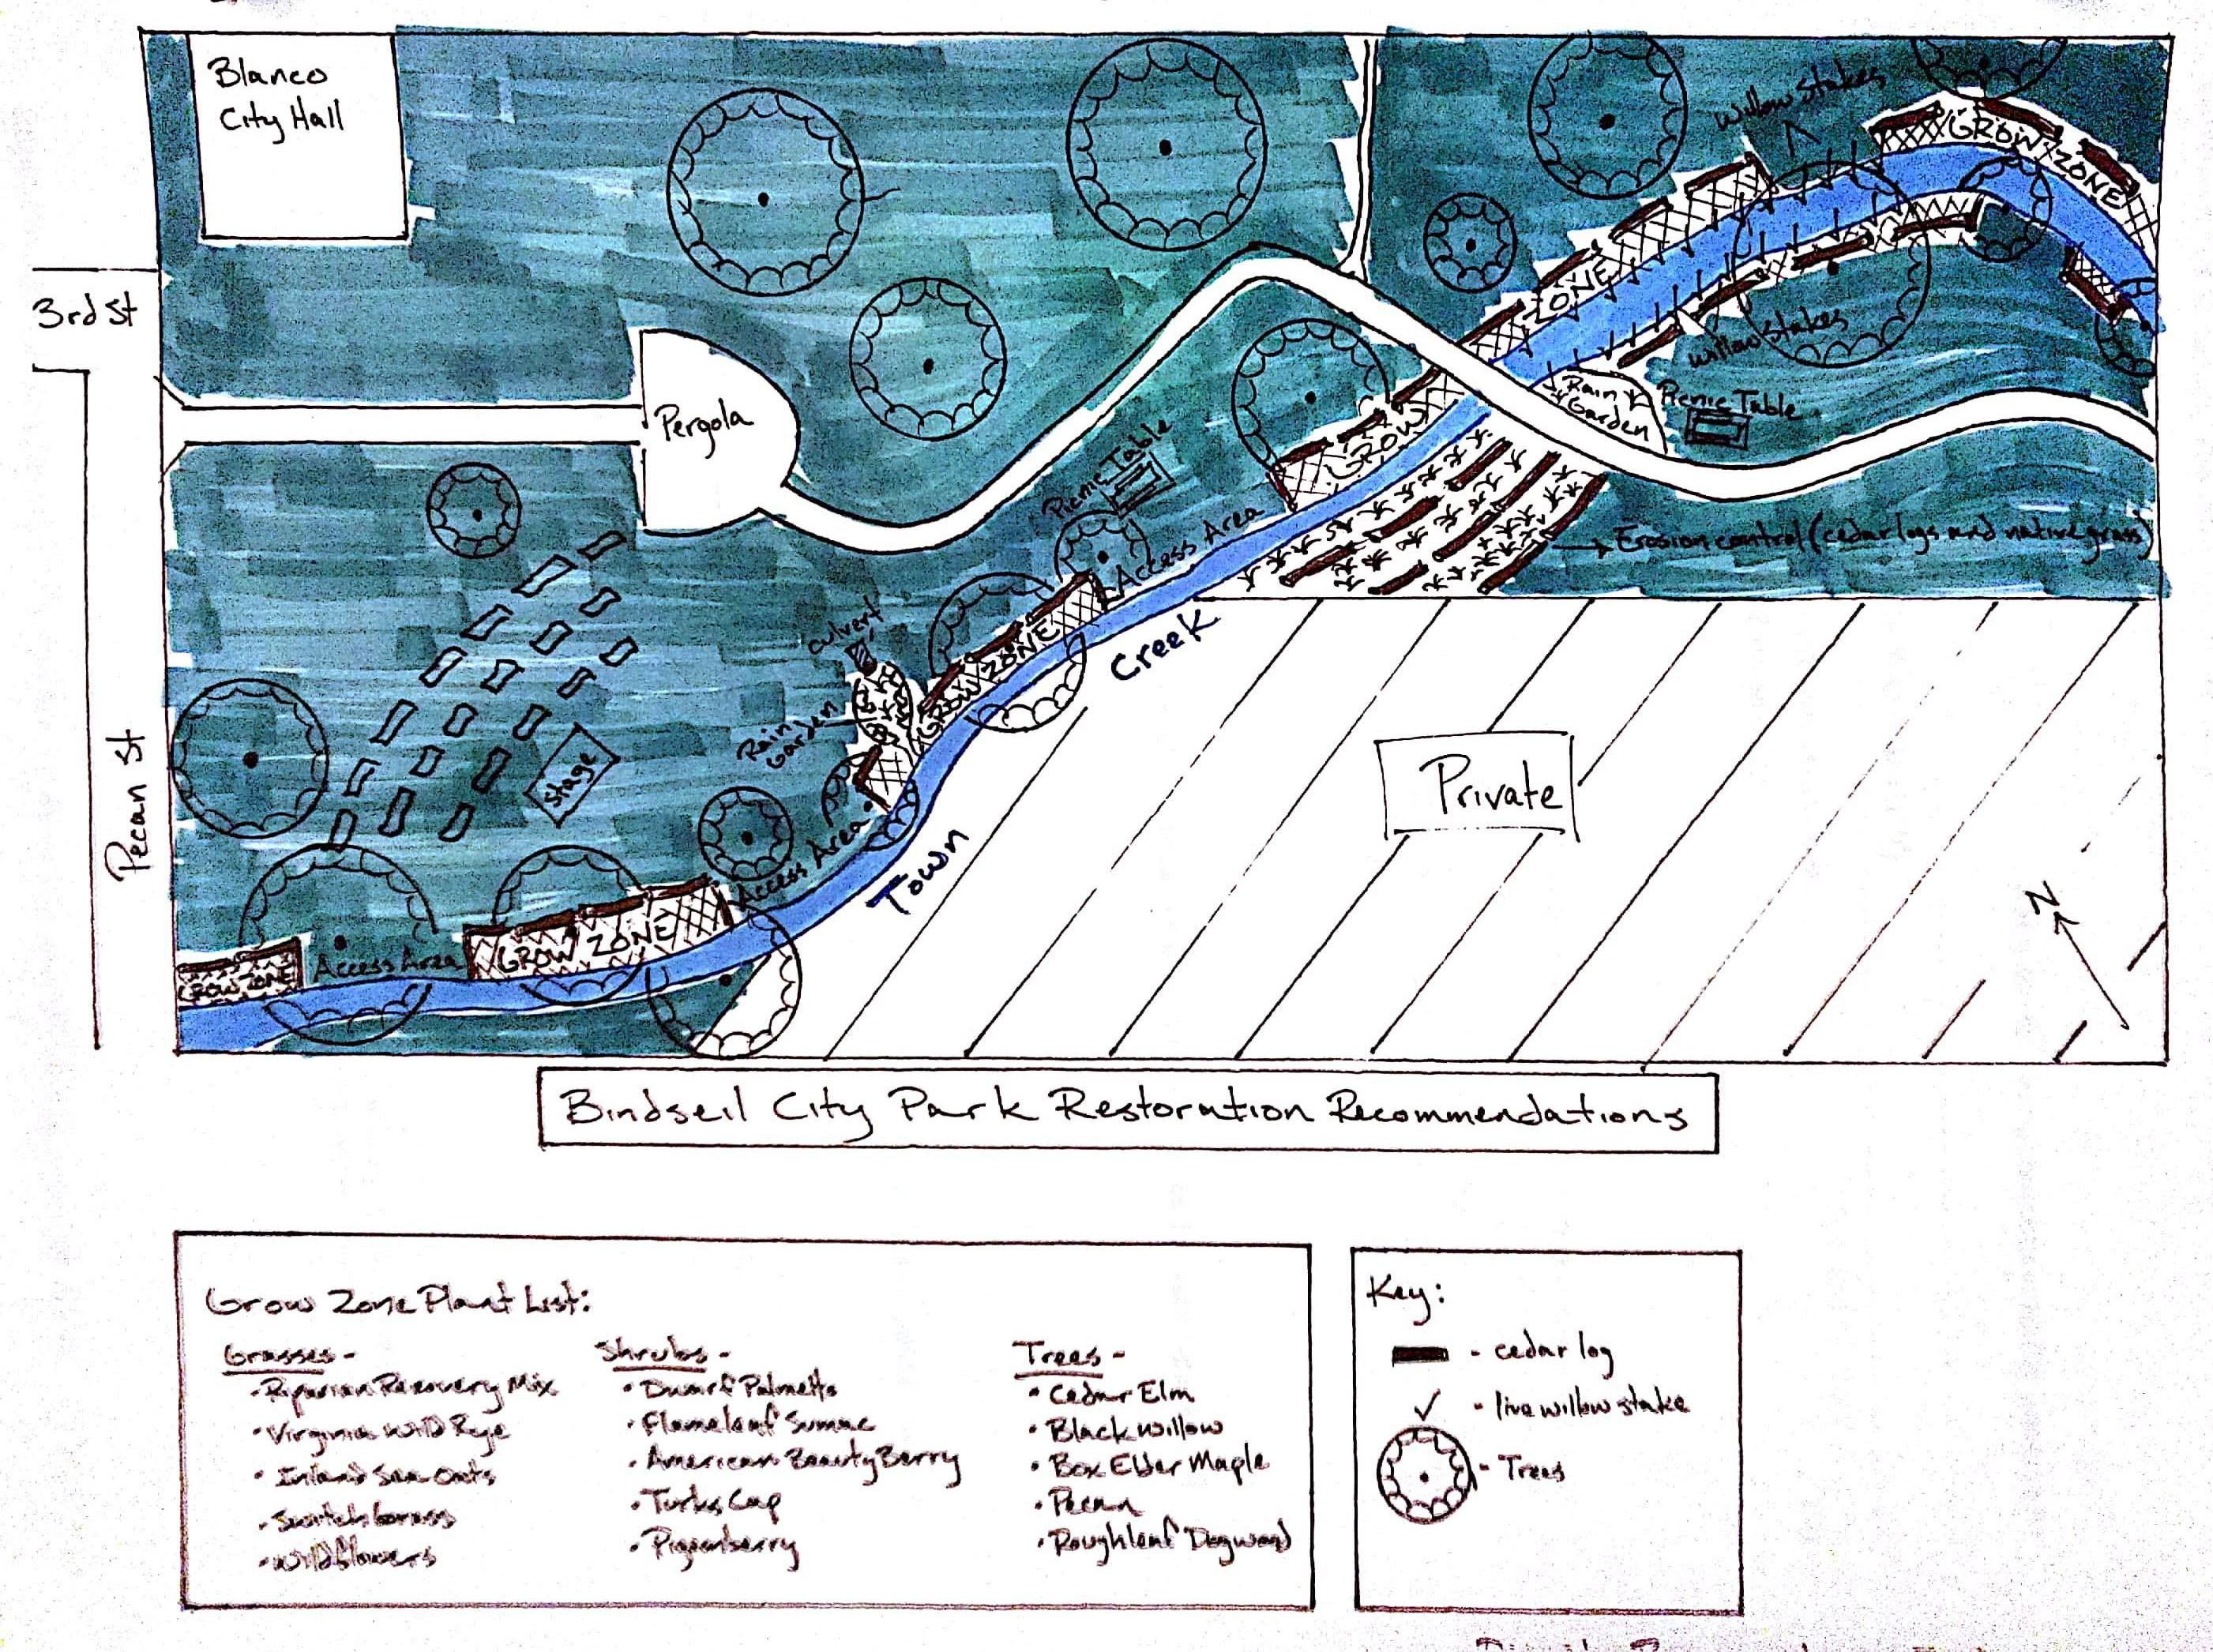 Bindseil City Park Restoration Recommendations